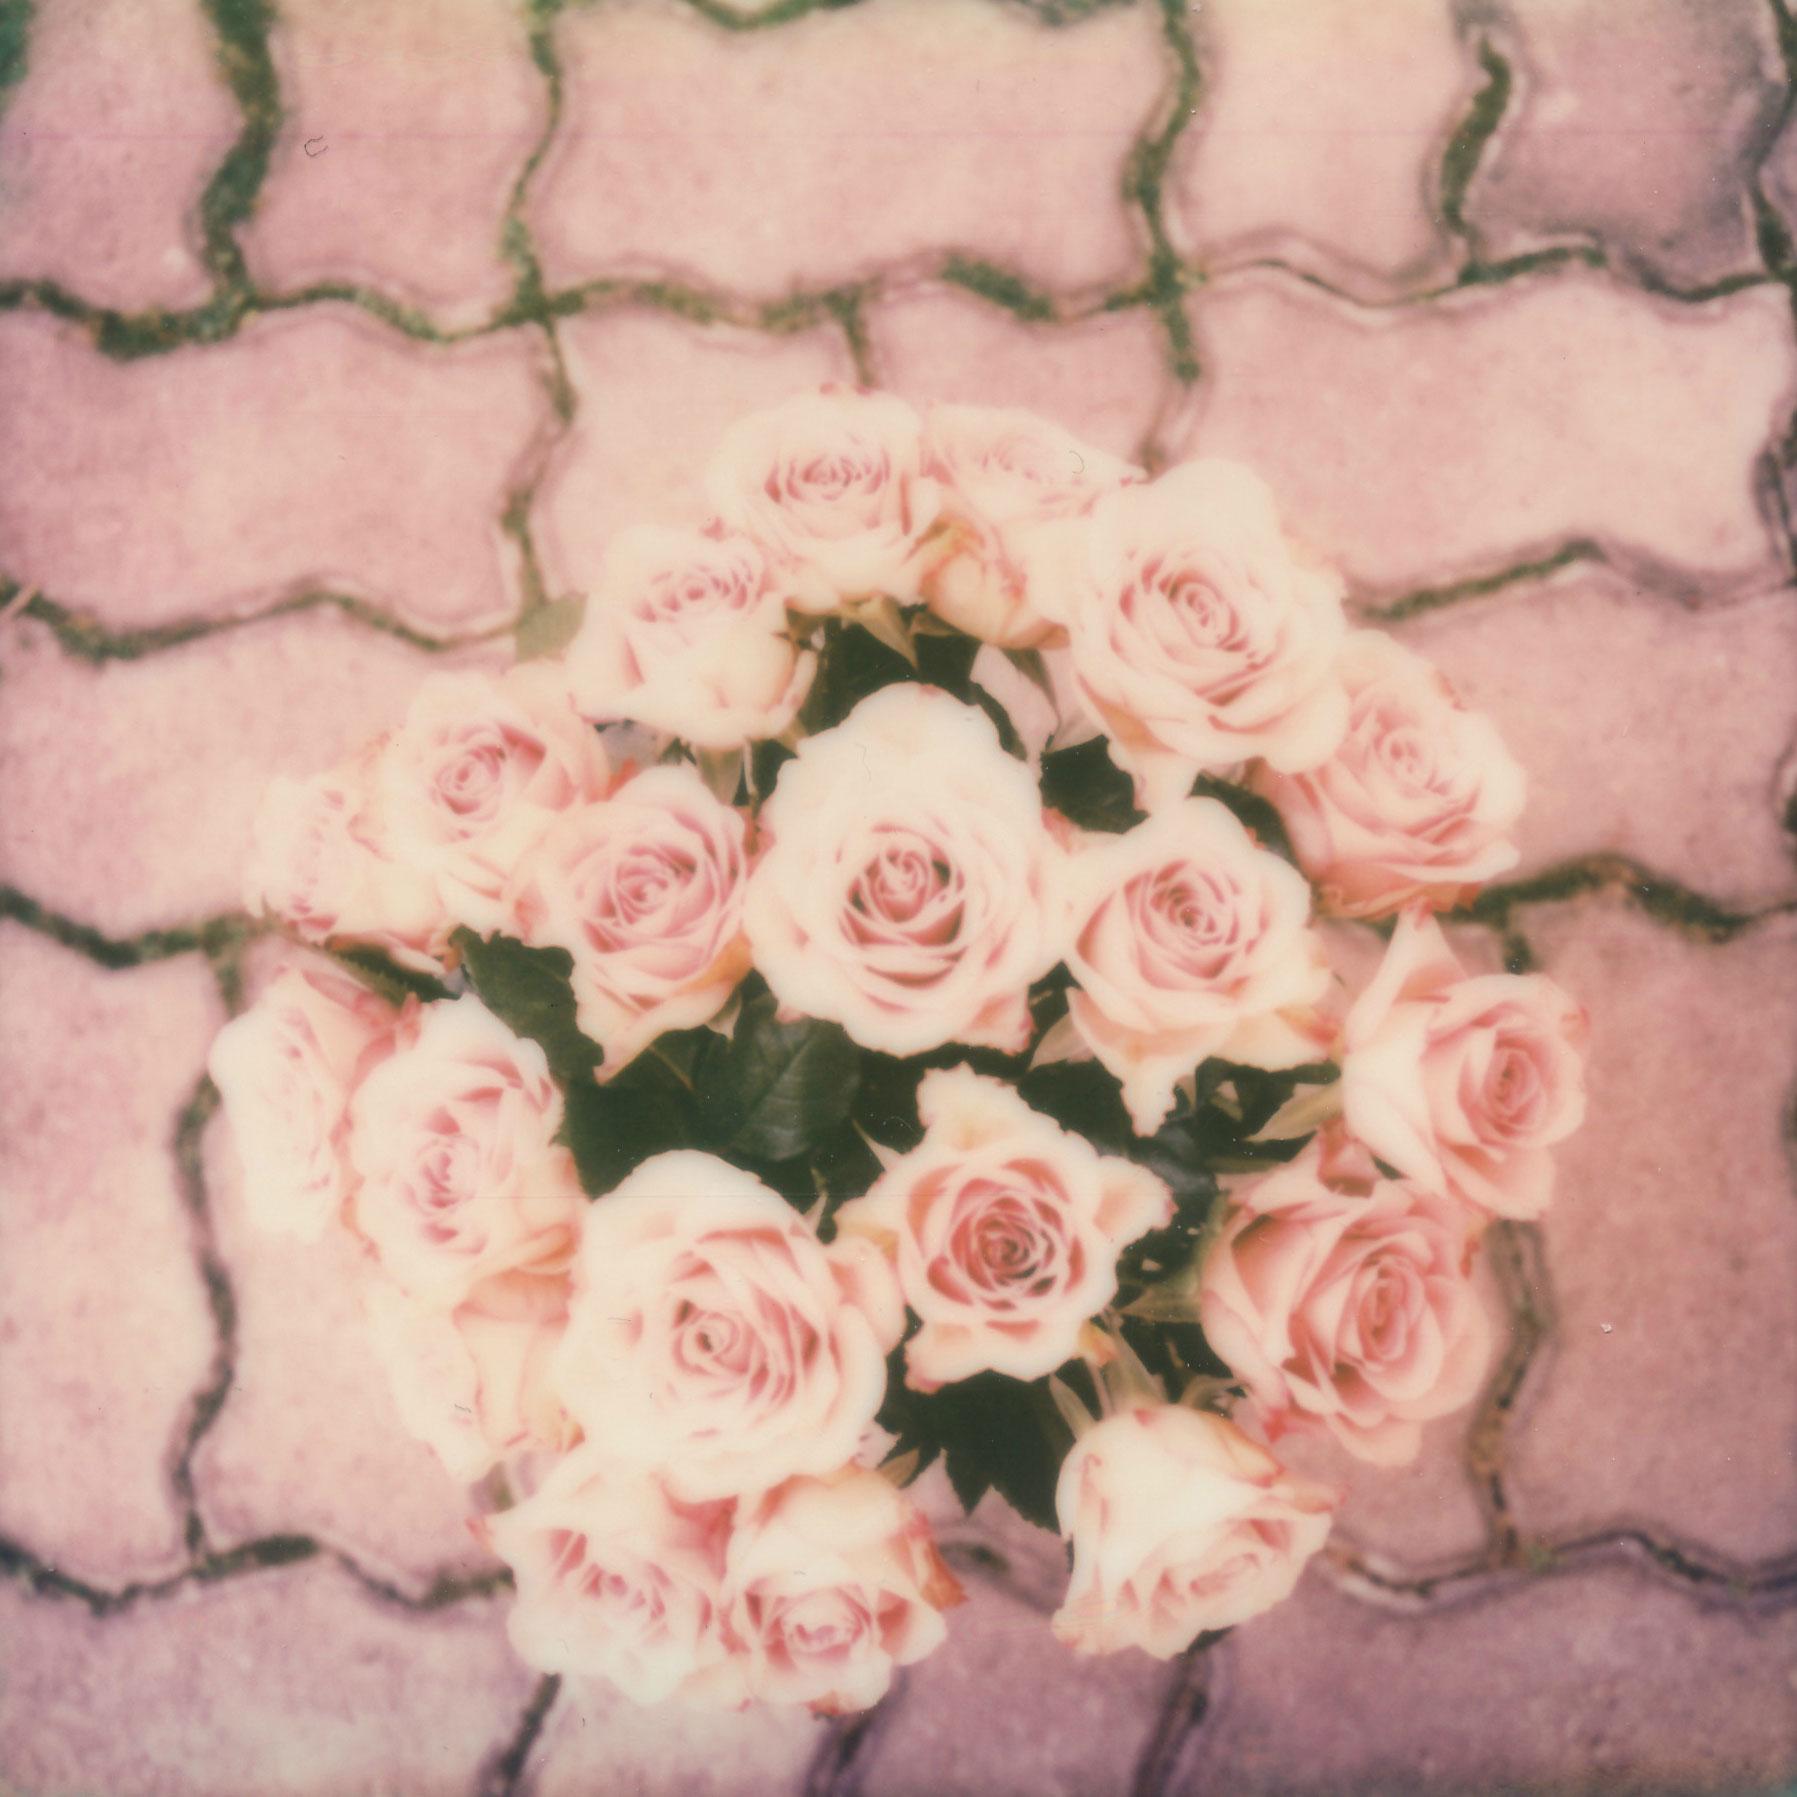 roses_sx70_sarabucher.jpg